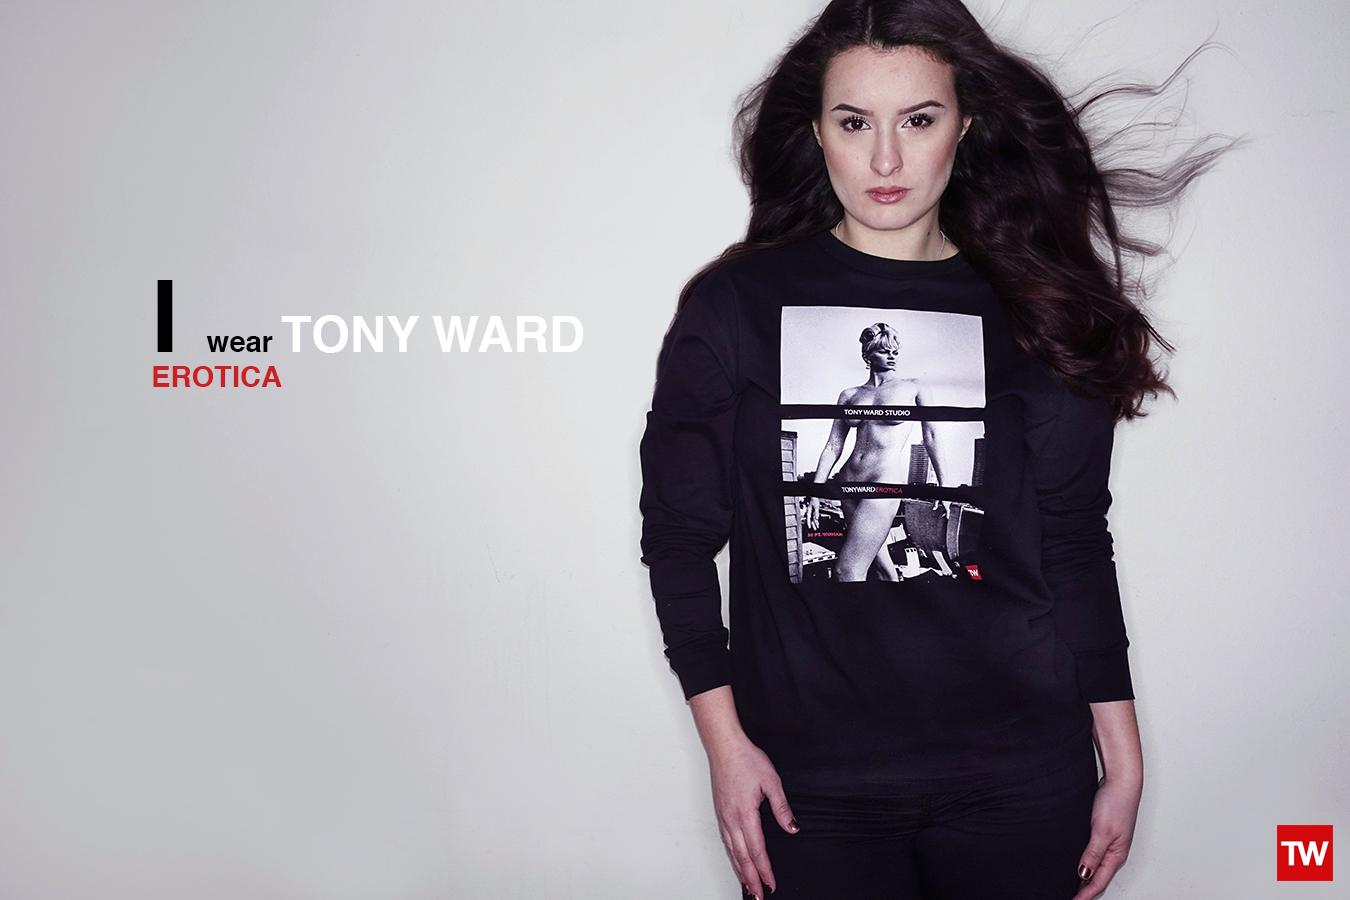 Tony_Ward_Studio_e-commerce_store_t-shirts_I_wear_erotica-model_Christina